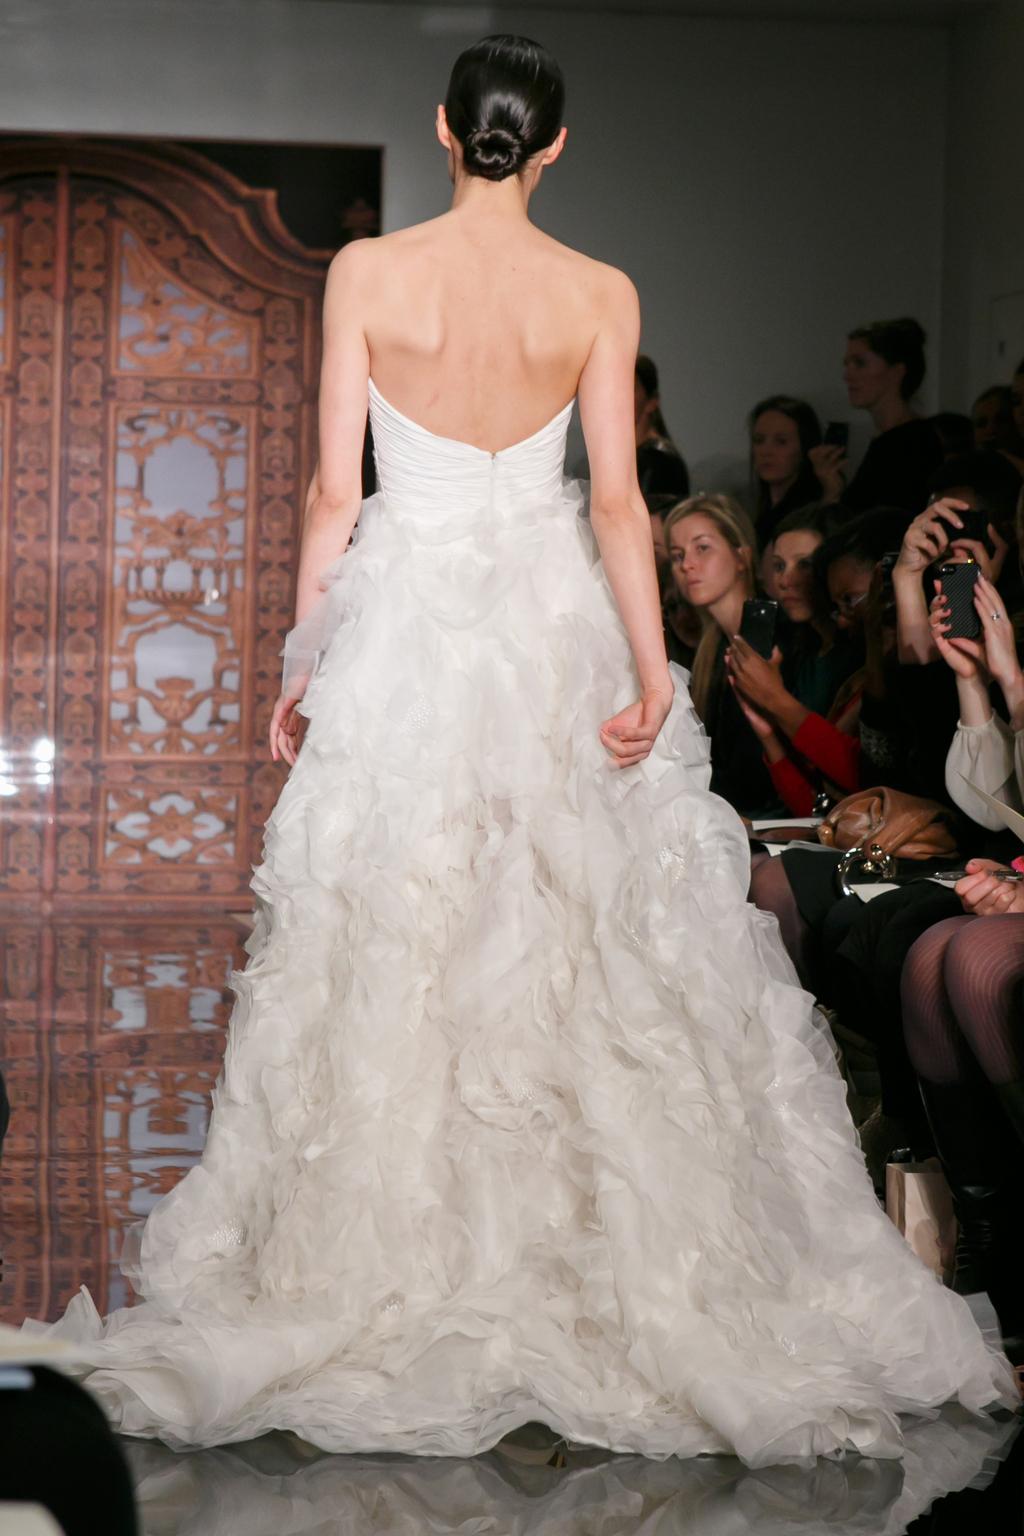 Reem-acra-wedding-dress-fall-2013-bridal-iselina-you-belong-to-me-b.full